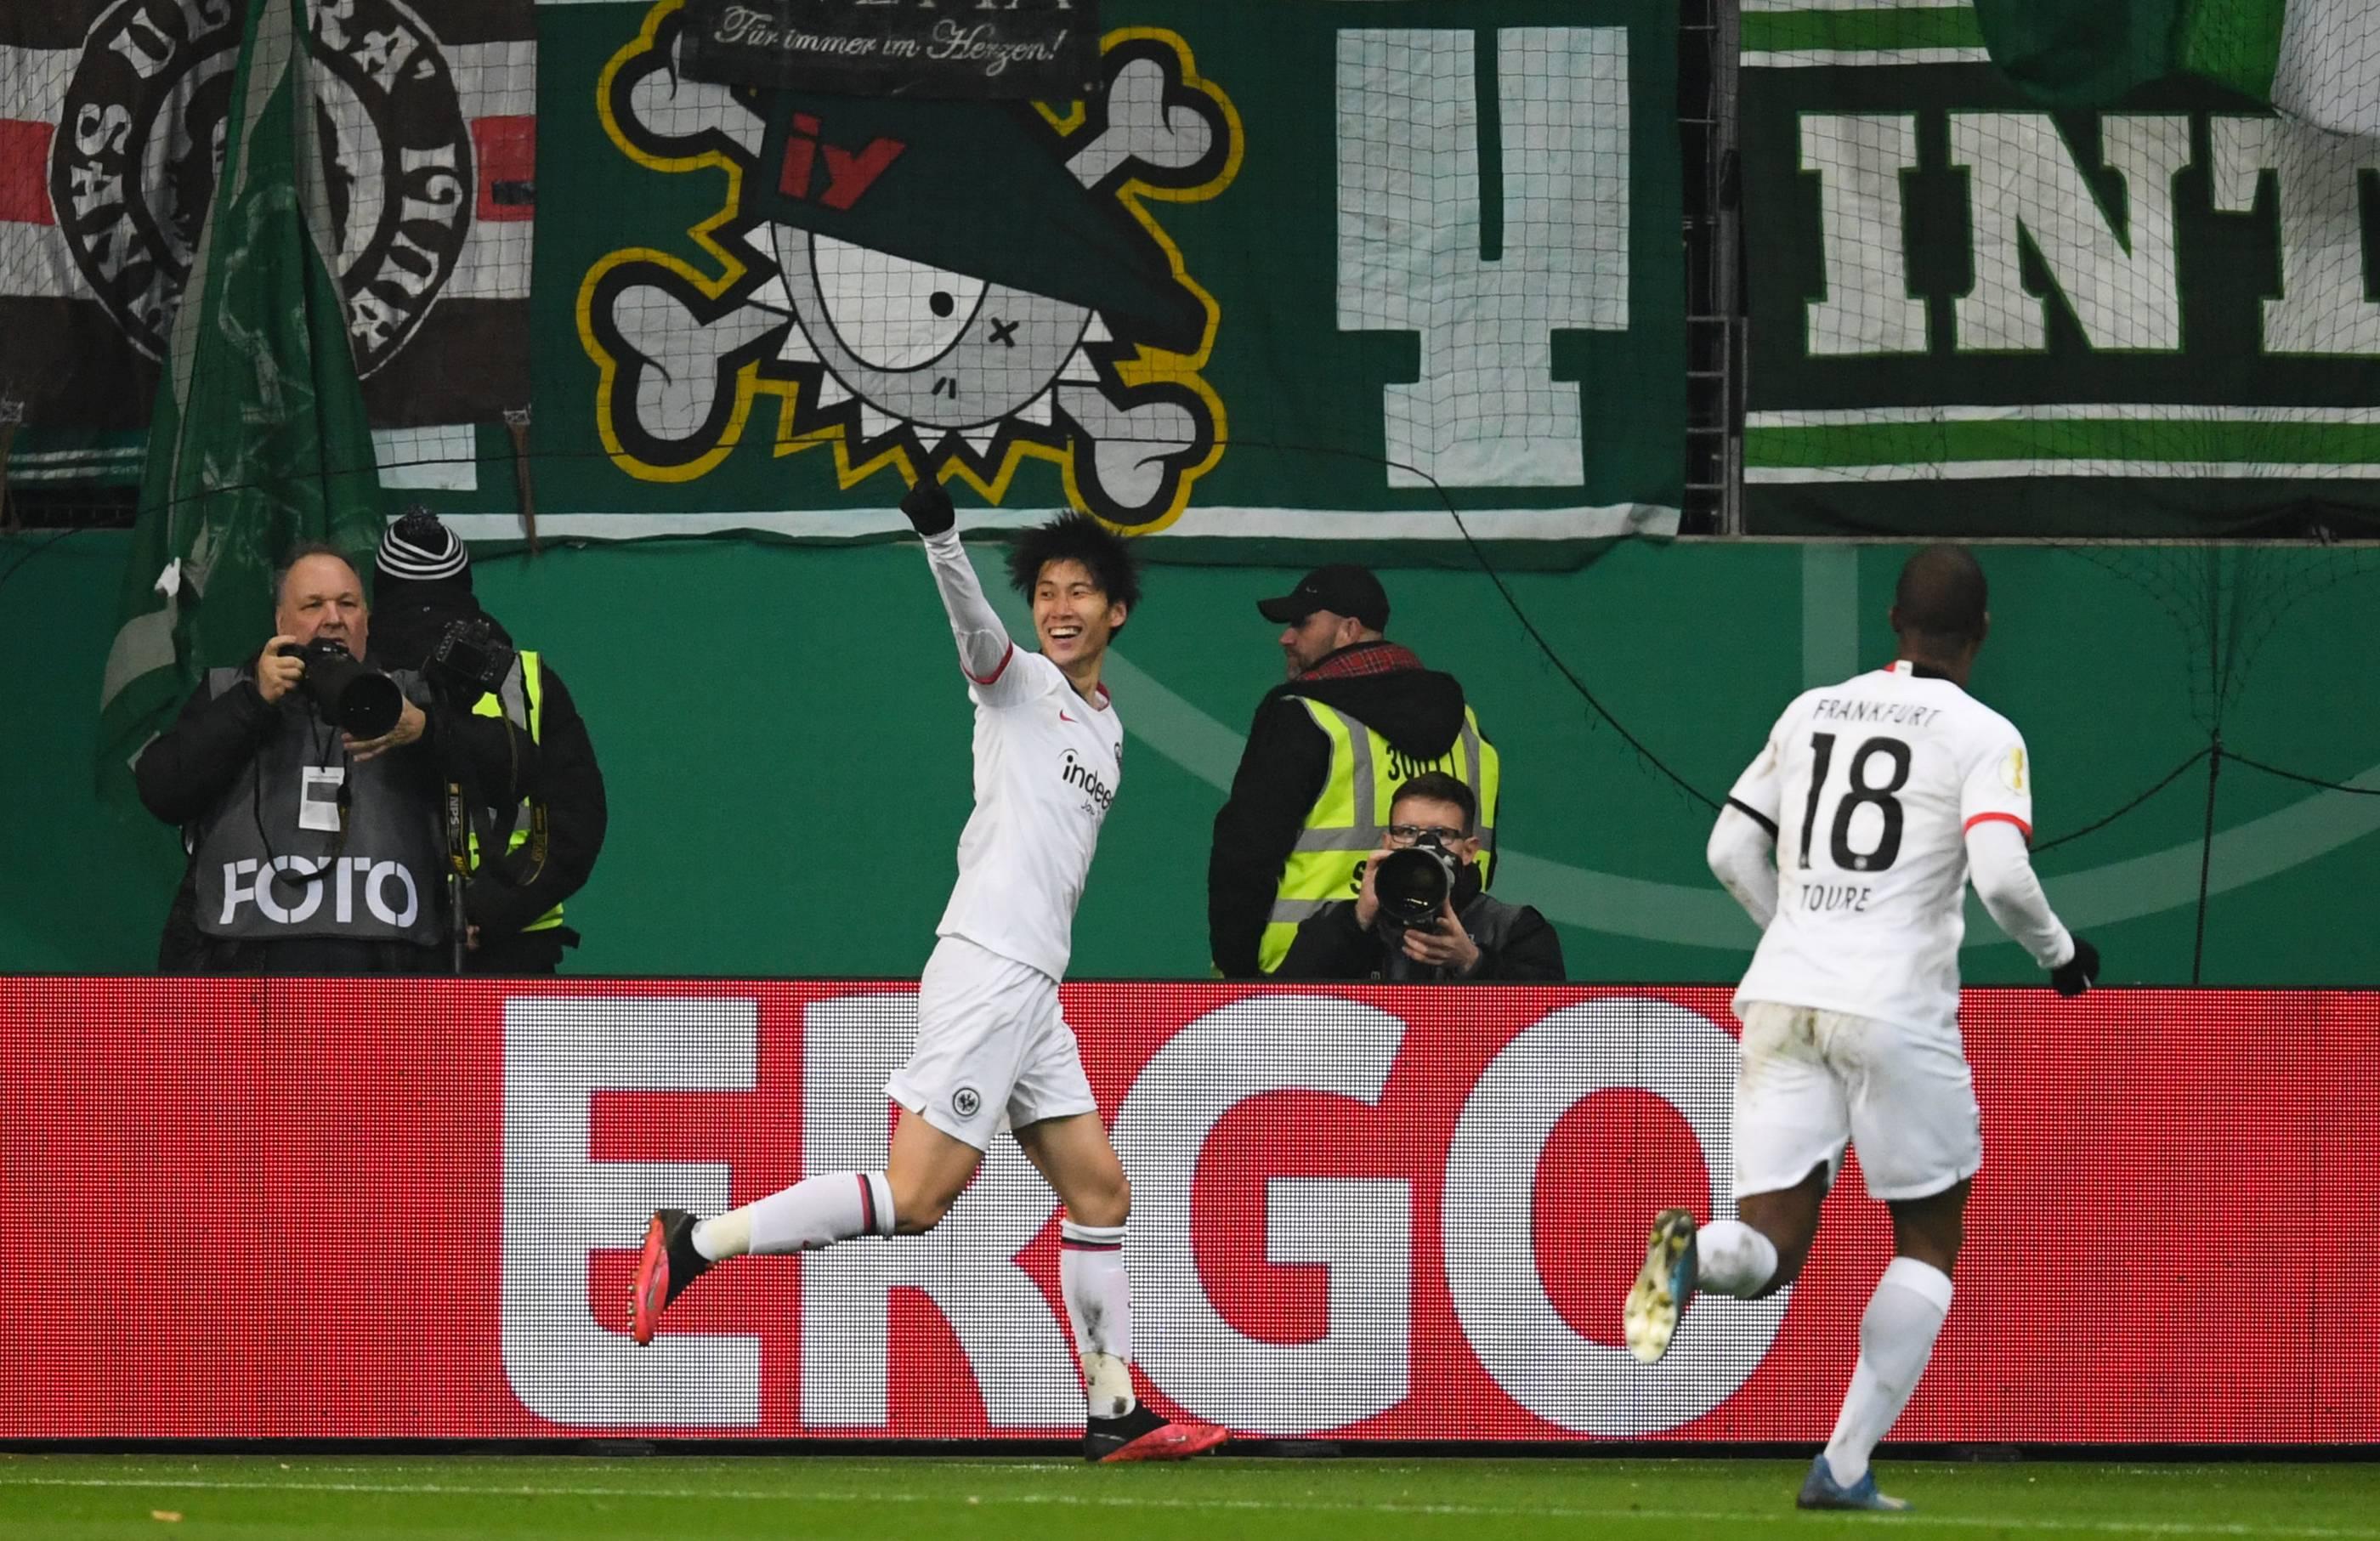 Dfb Pokal Frankfurt Bremen